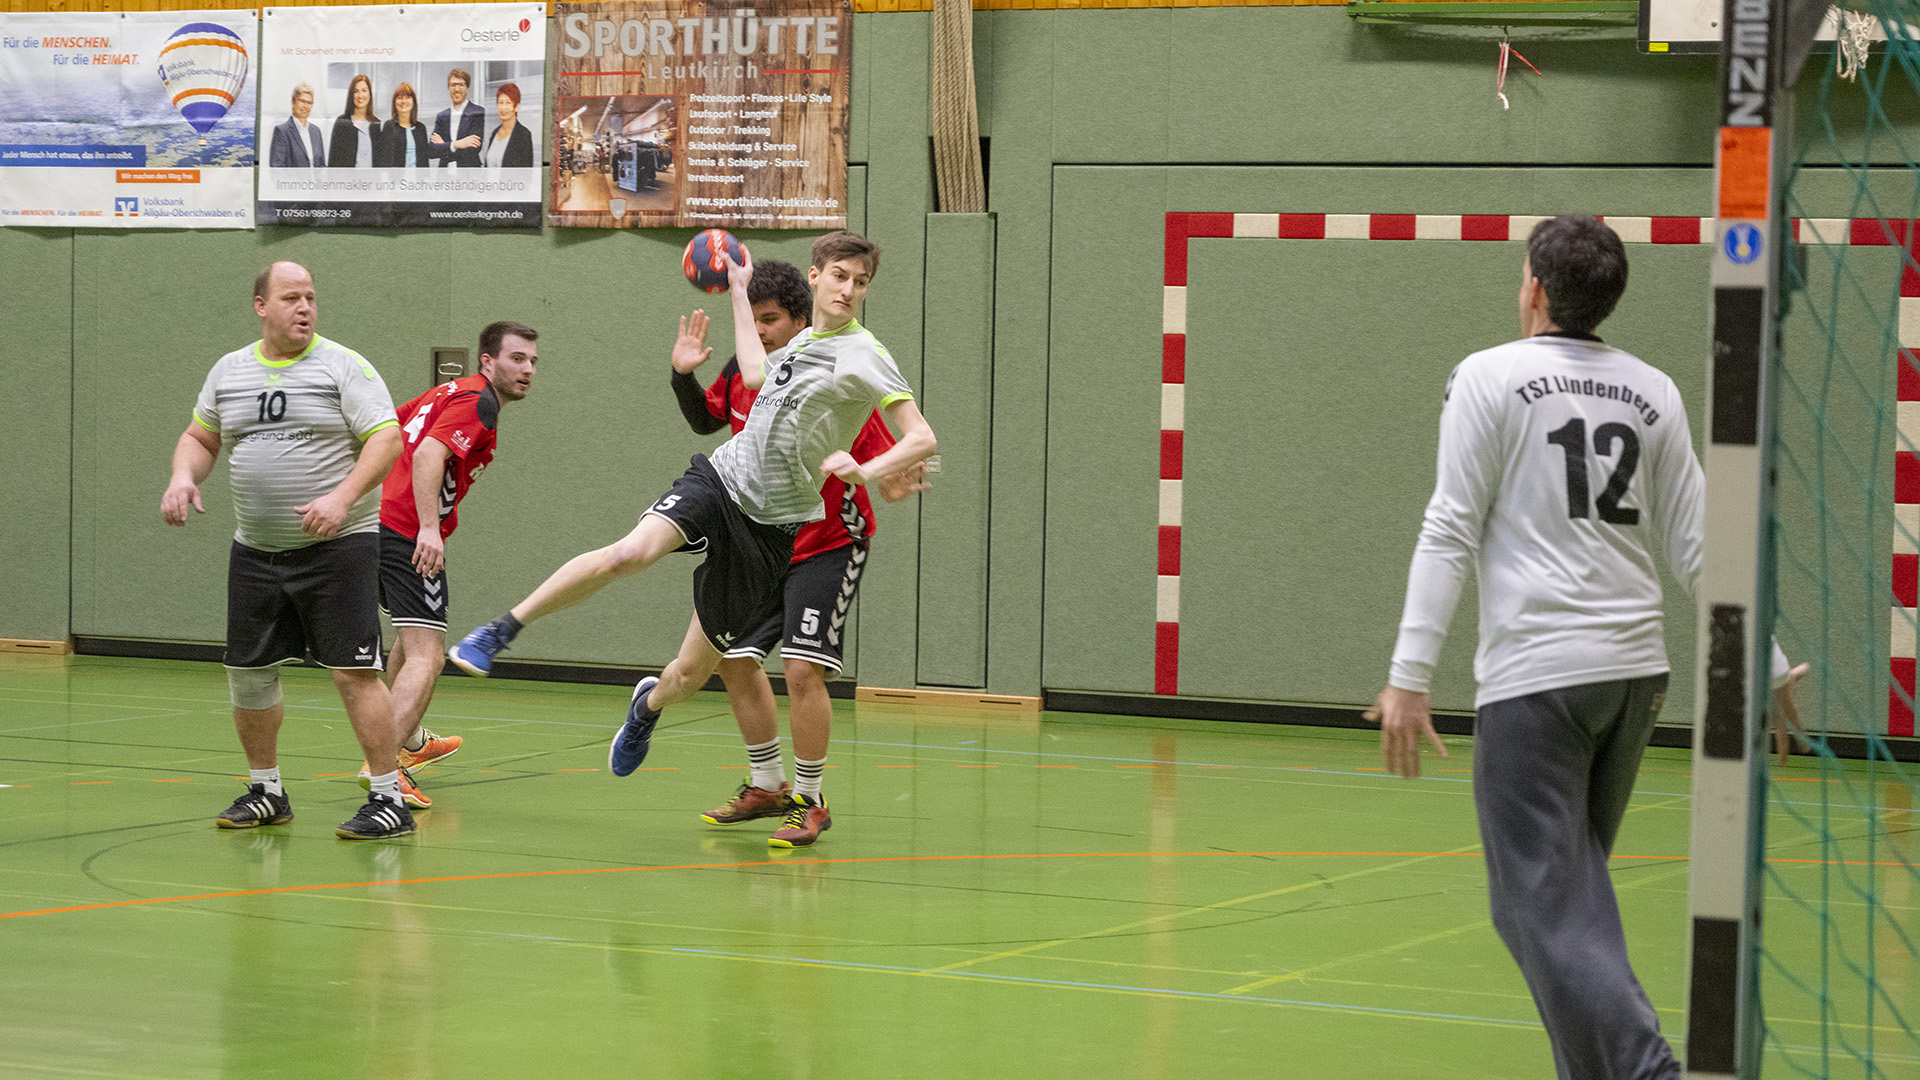 066Slider_Herren2_tsg_leutkirch_handball